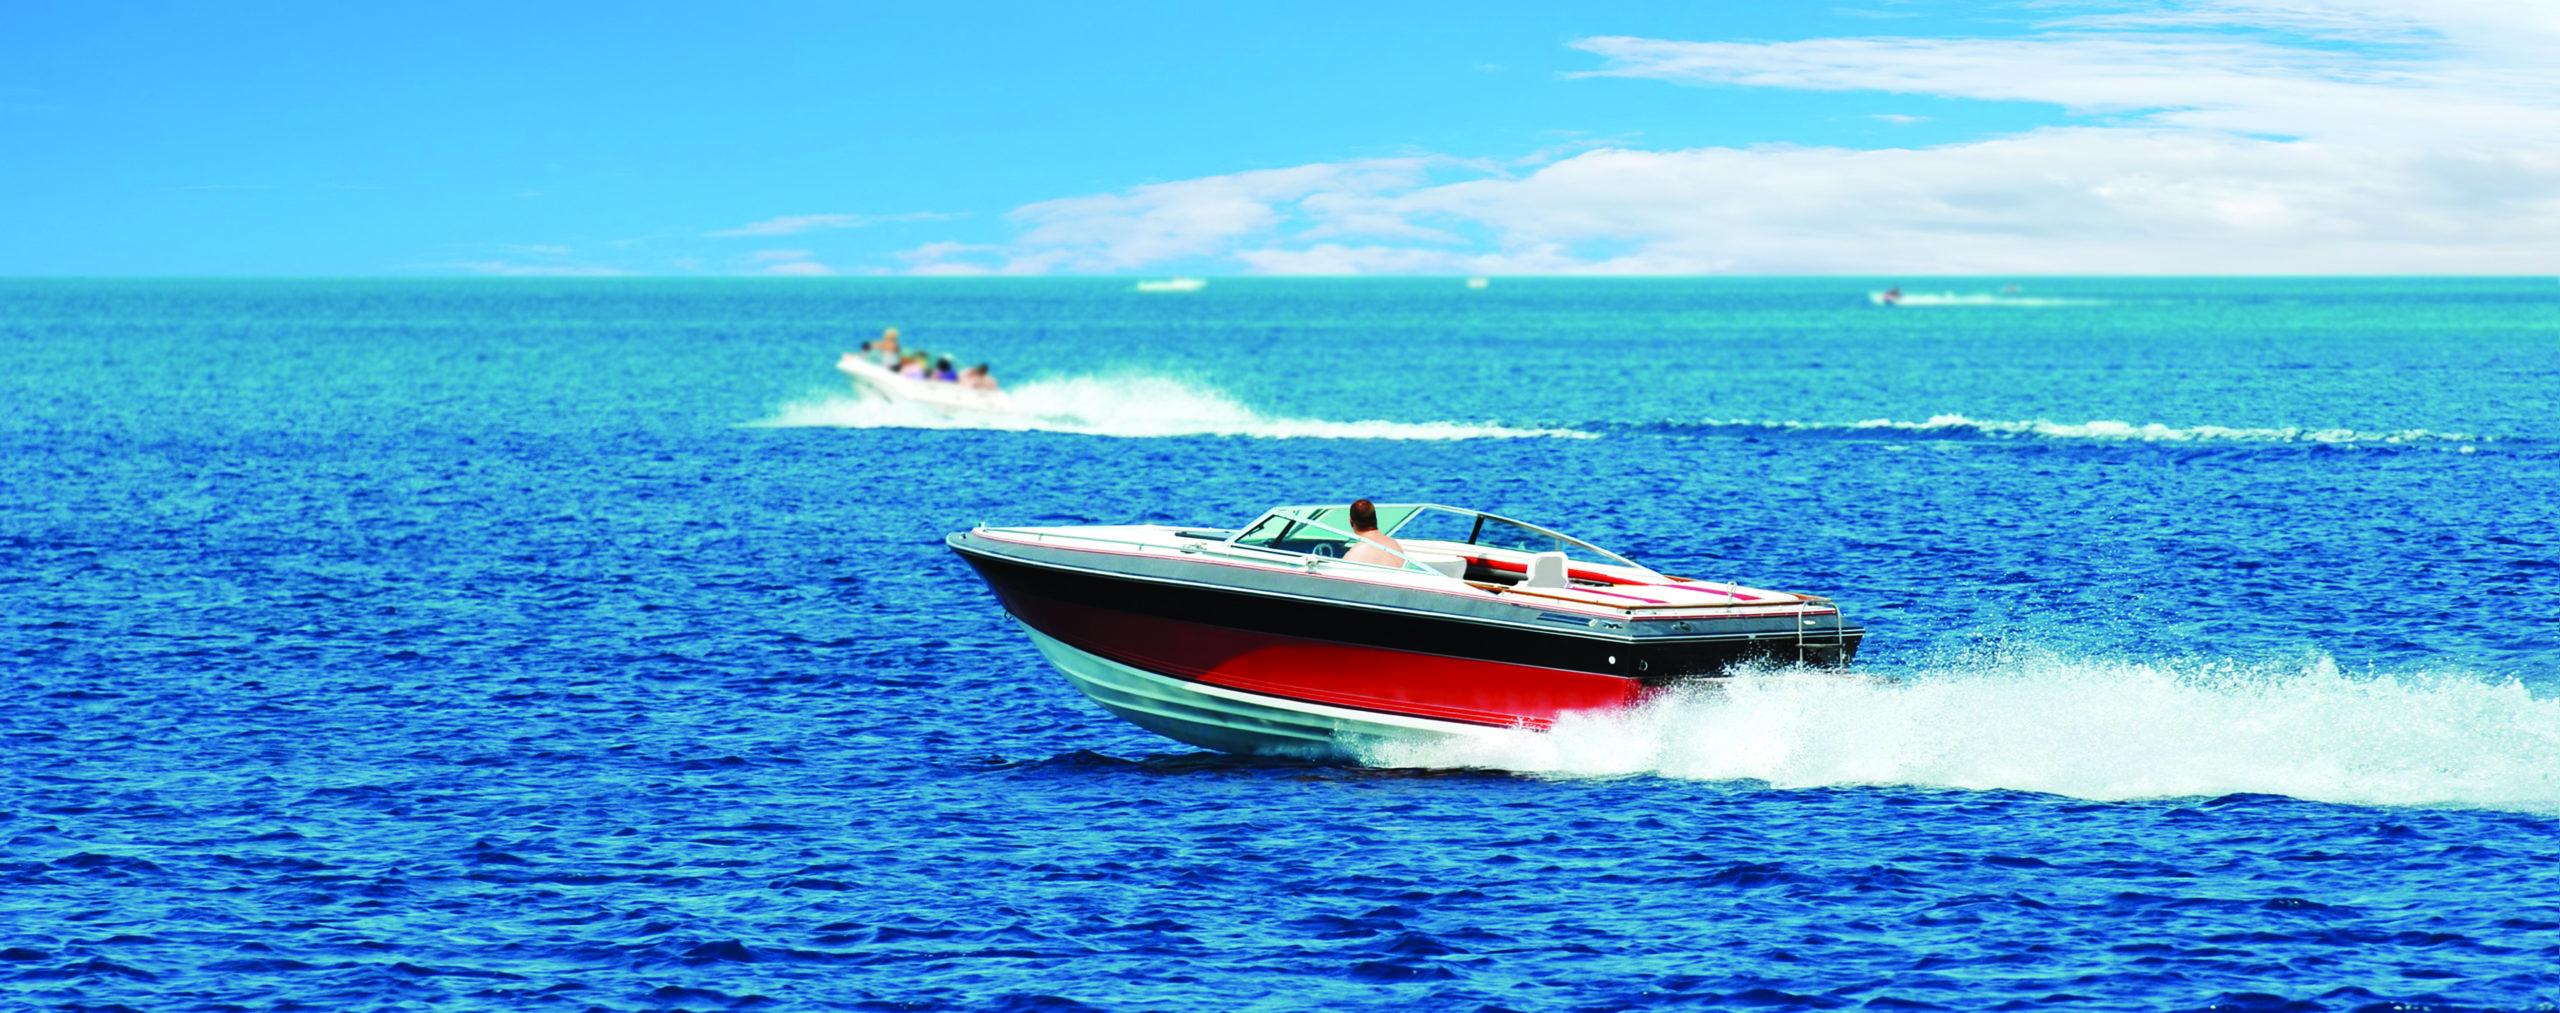 Avoid summer boating risks - buy insurance